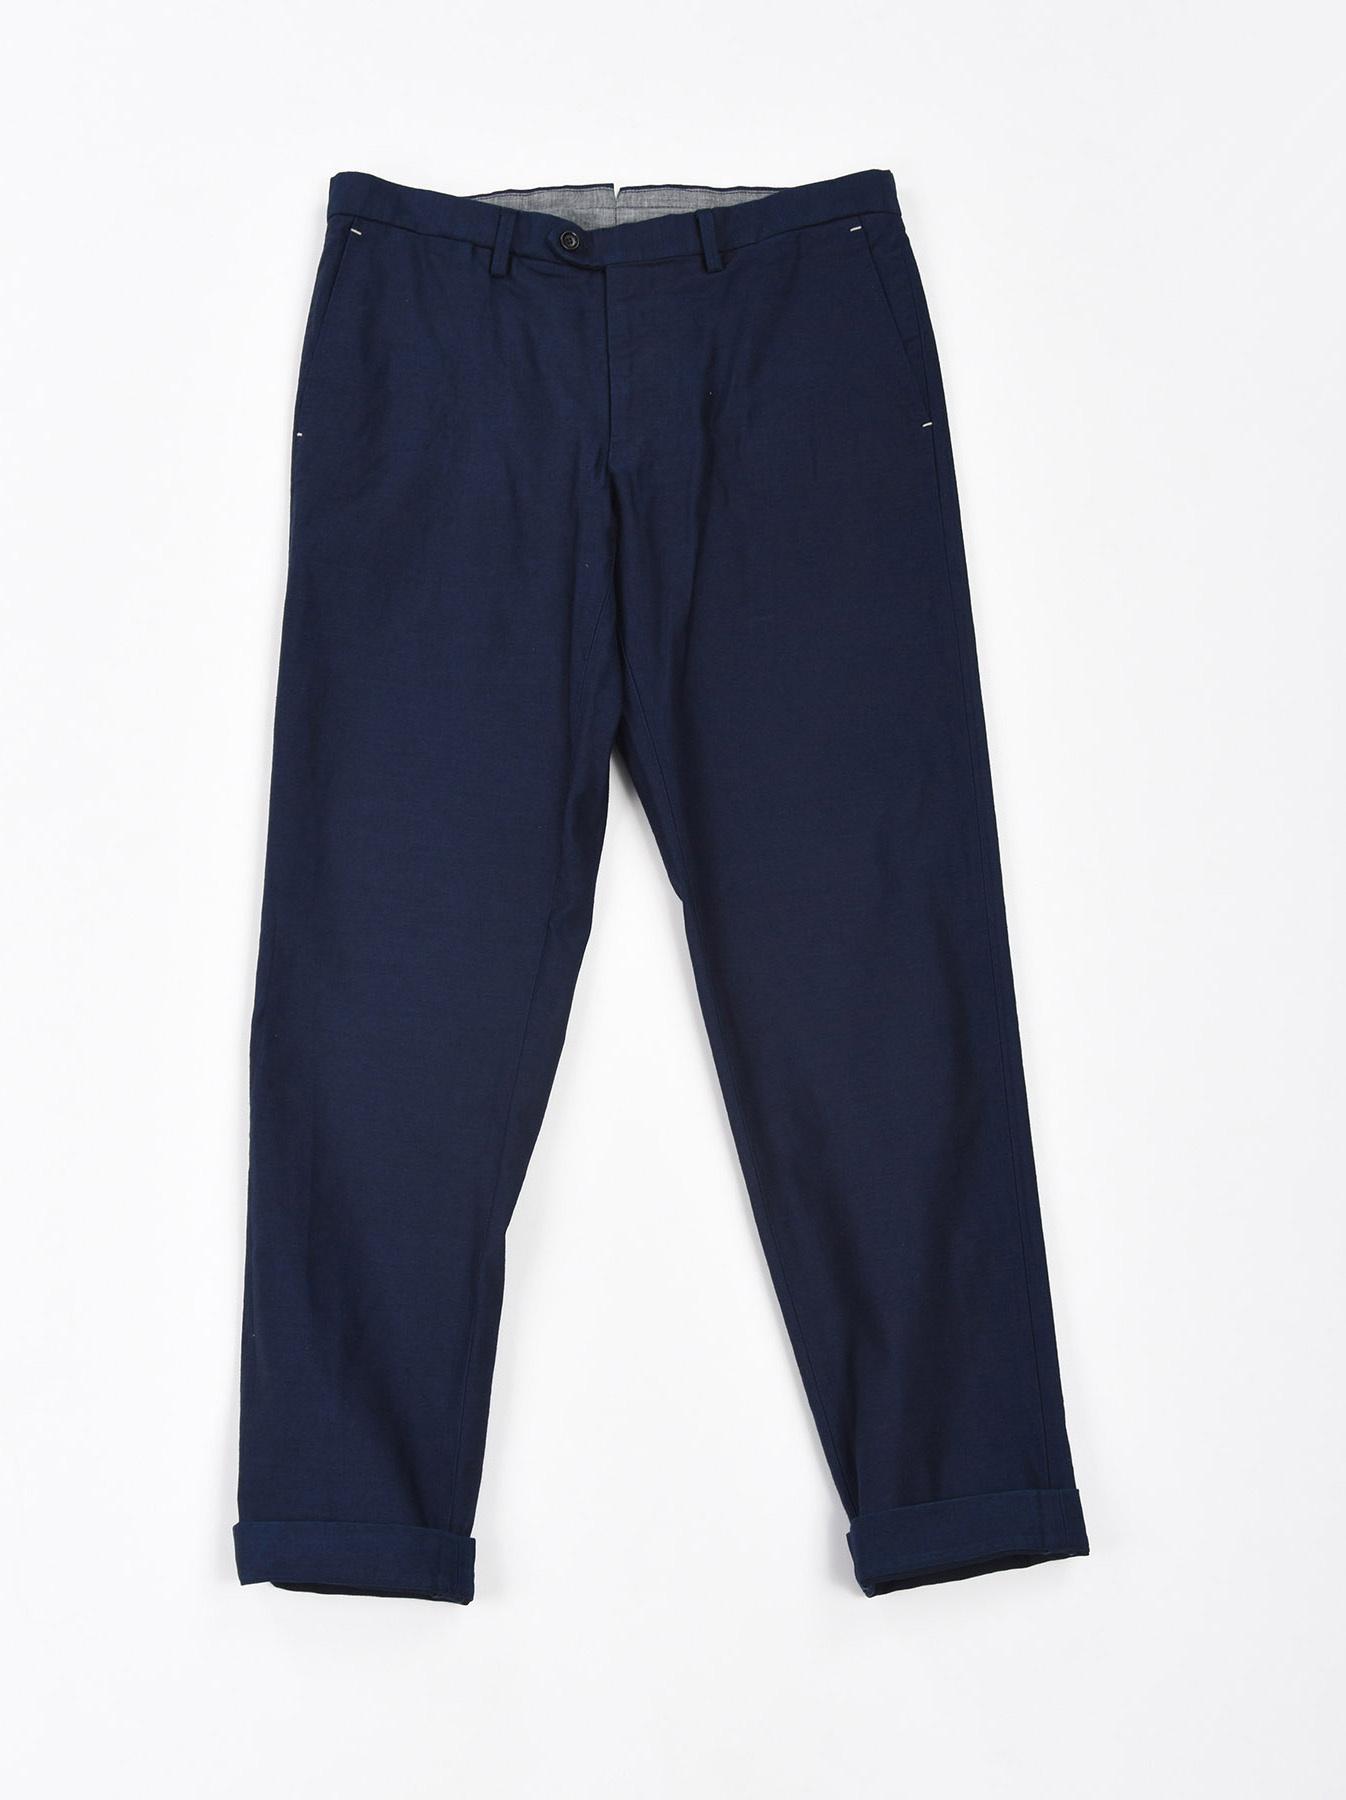 WH Indigo Mugi Yoko-shusi Soroe Pants-1